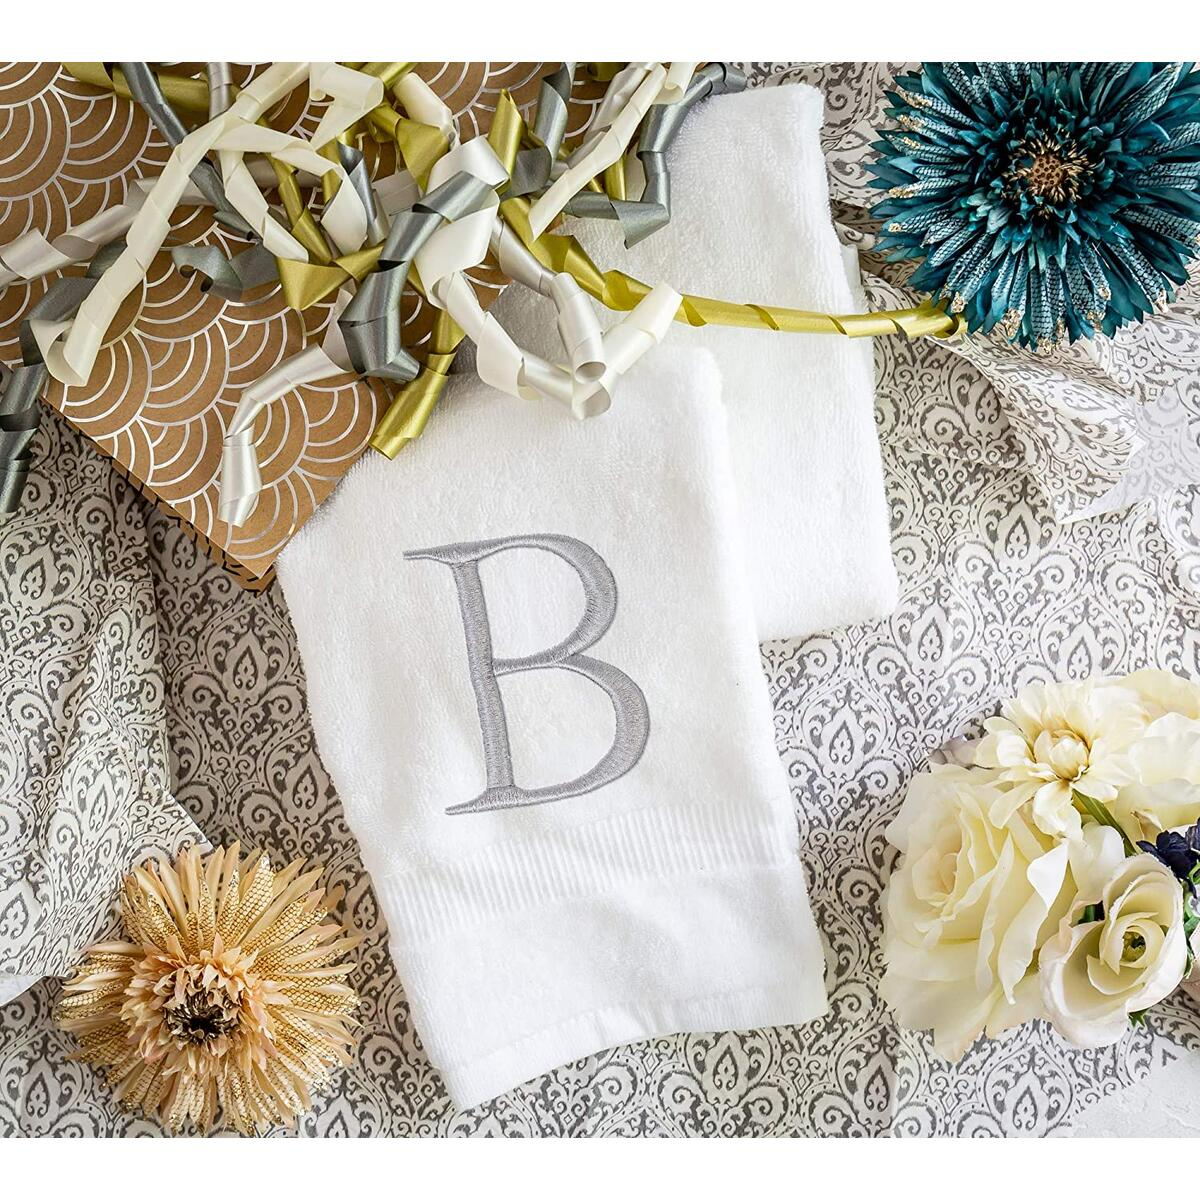 Organic Monogrammed Hand Towel for Bathroom Set of 2 - Letter B